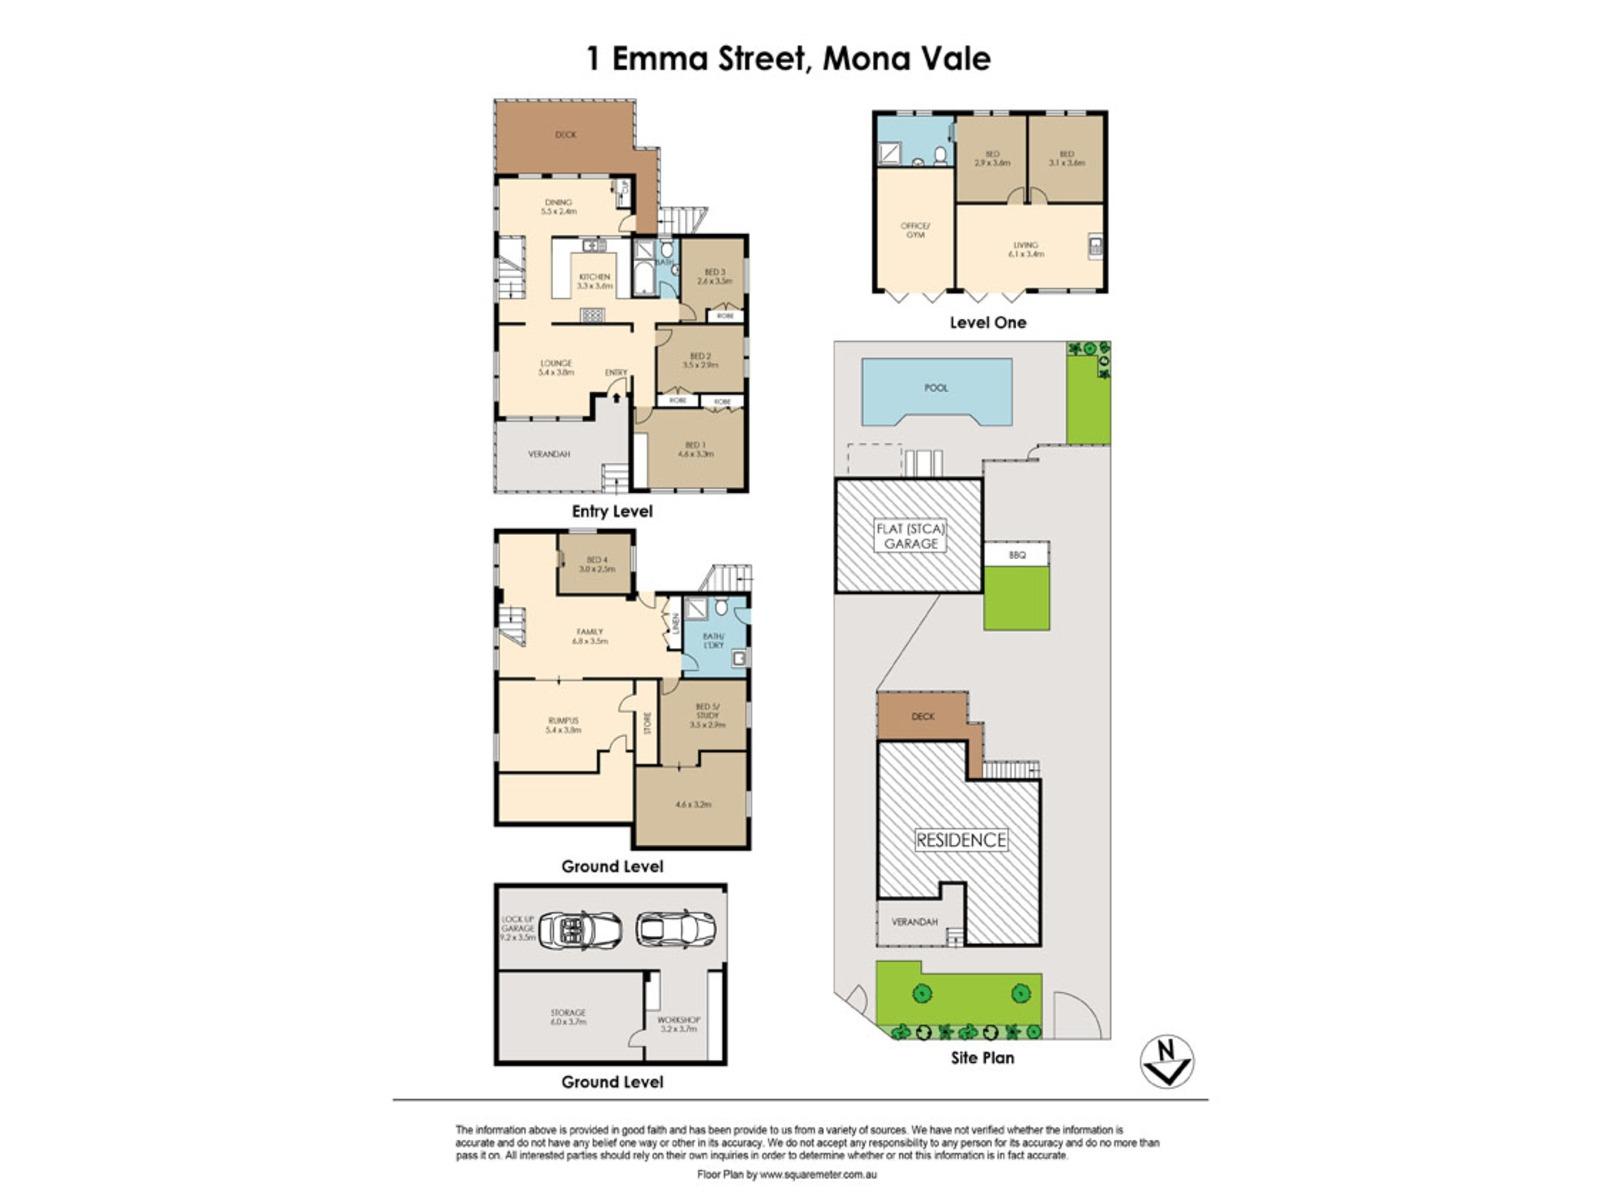 1 Emma Street, Mona Vale